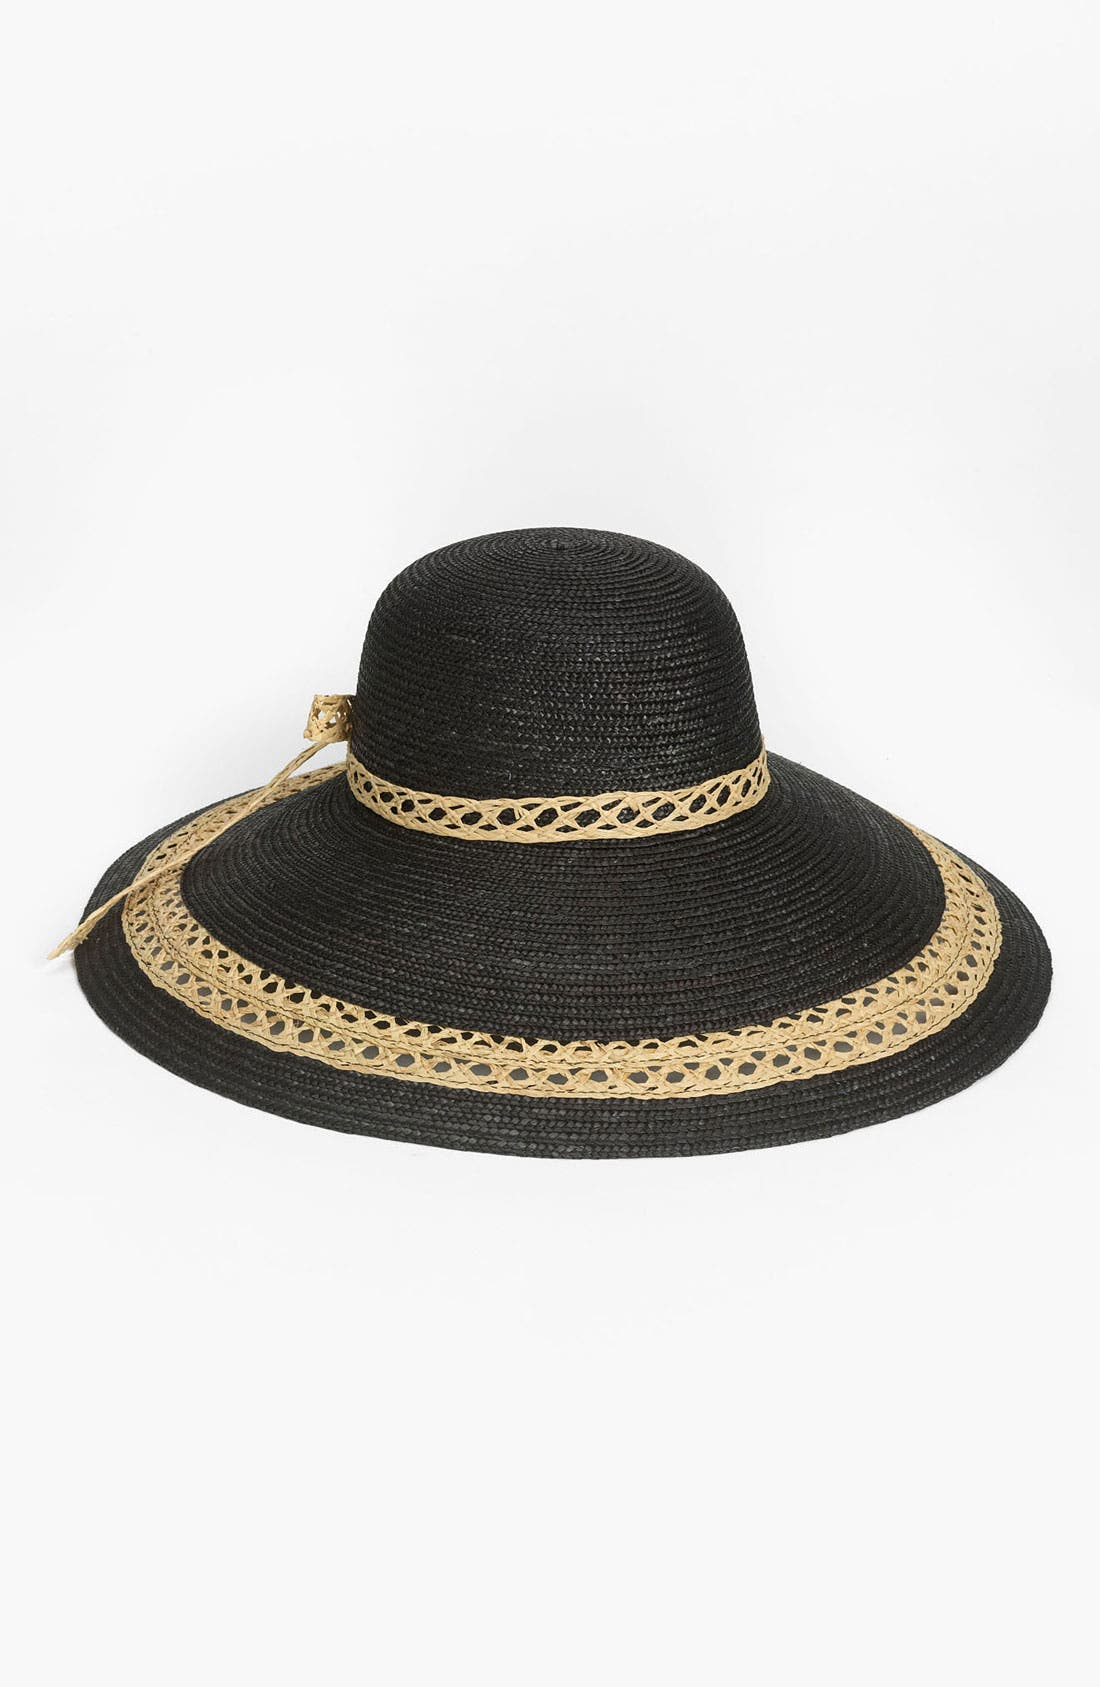 Main Image - Nordstrom Wide Brim Sun Hat